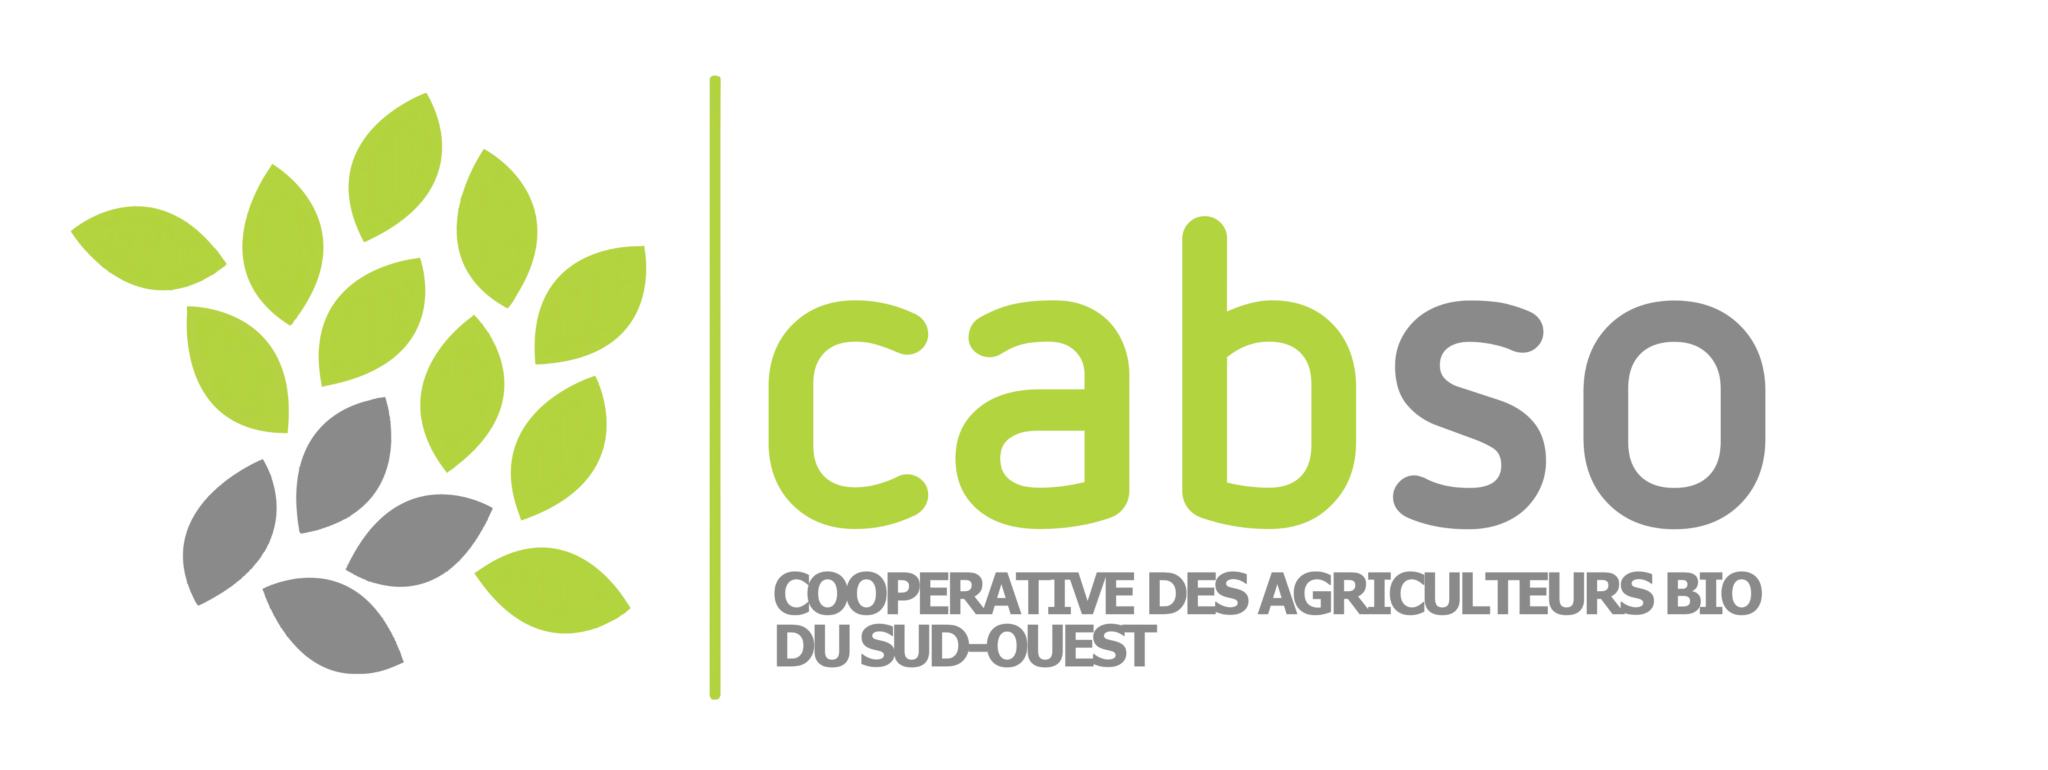 Logo Cabso